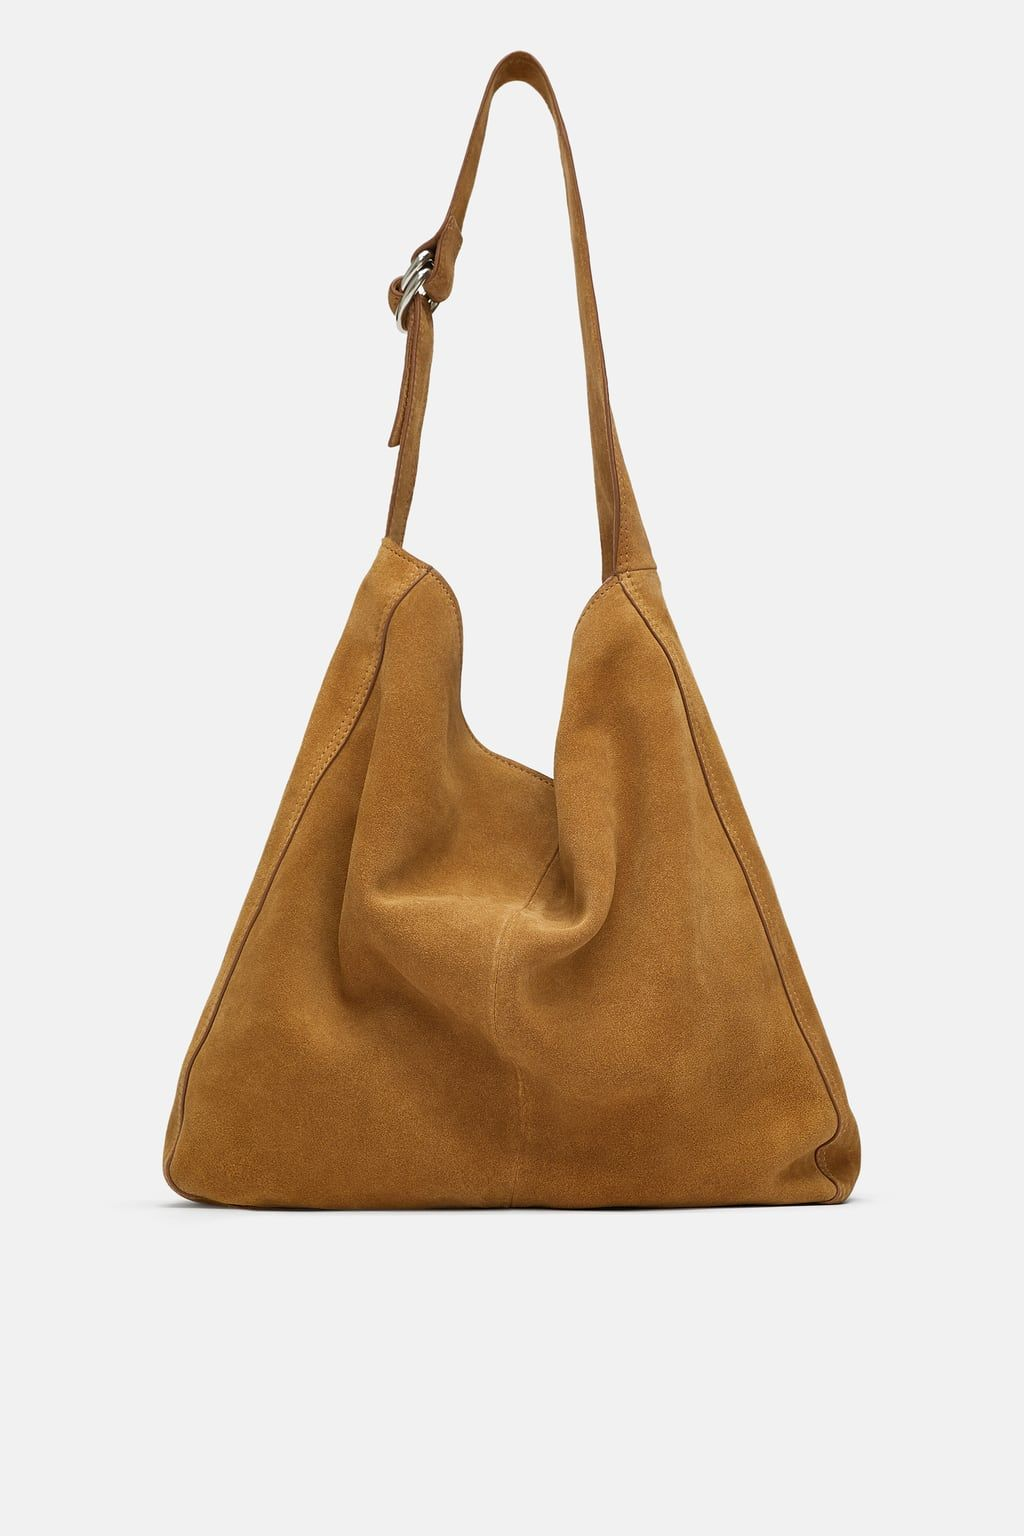 6b7942e3 Split leather bucket bag in 2019 | Fashion backpacks | Bags, Fashion ...